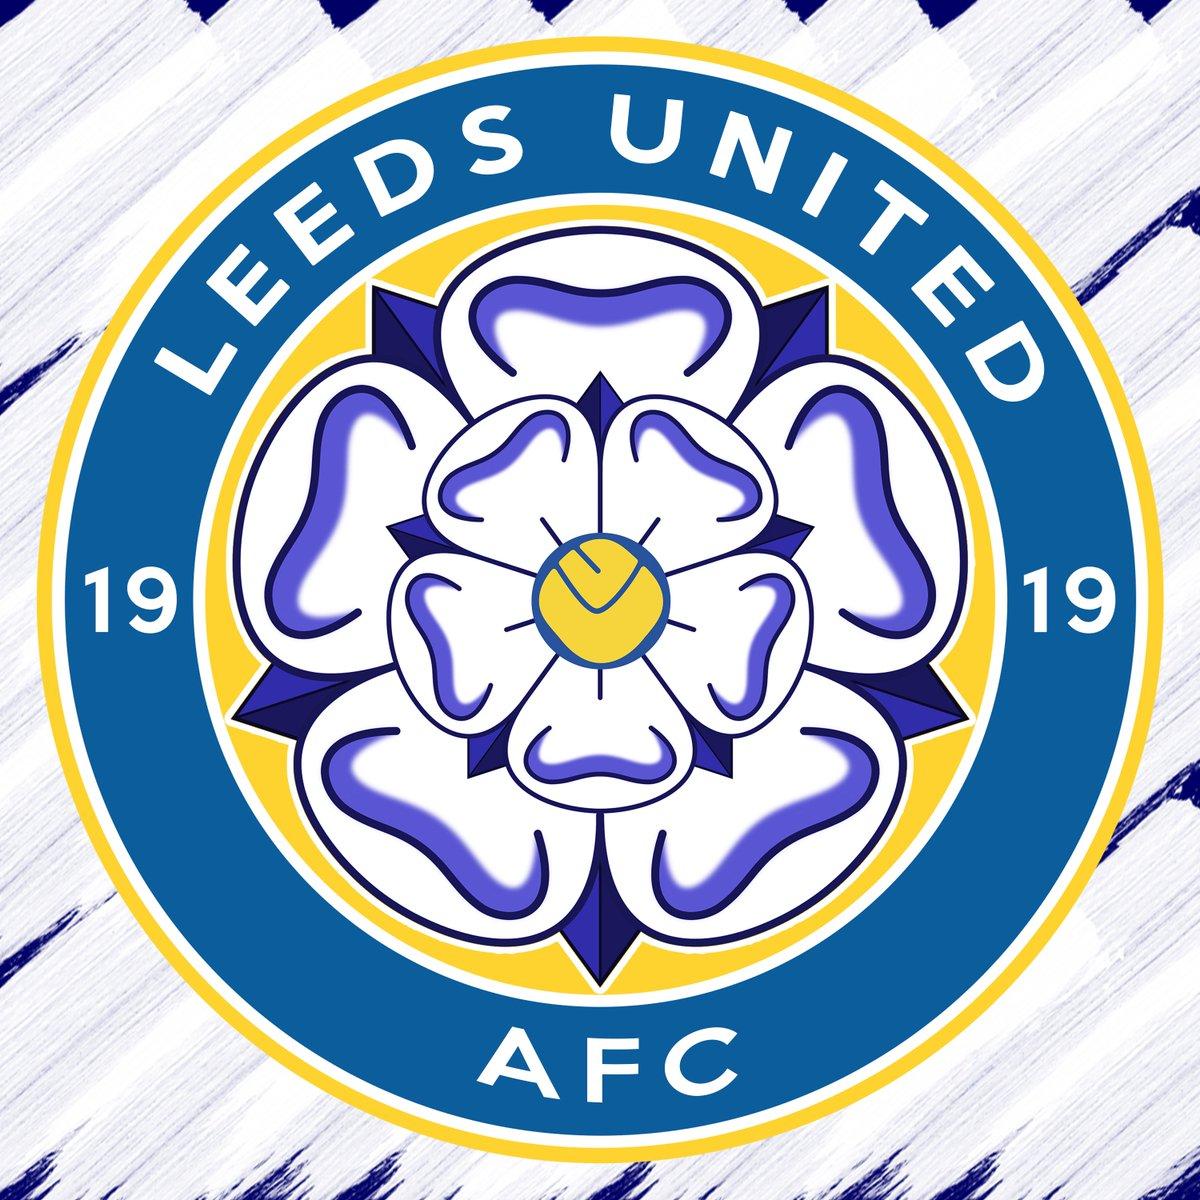 Leedsunitedbadge Hashtag On Twitter